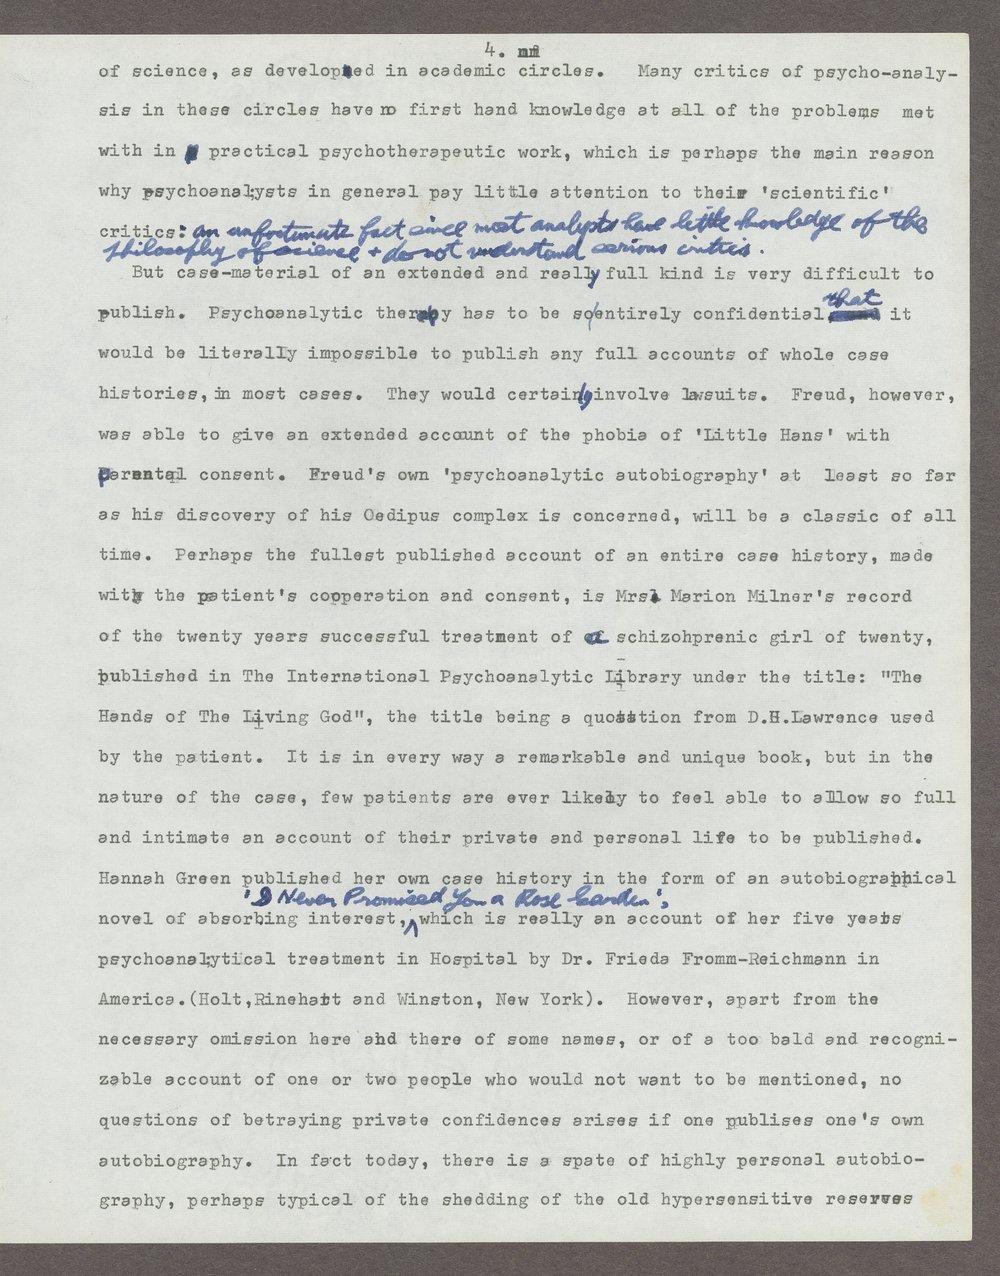 Harry Guntrip manuscripts - 7